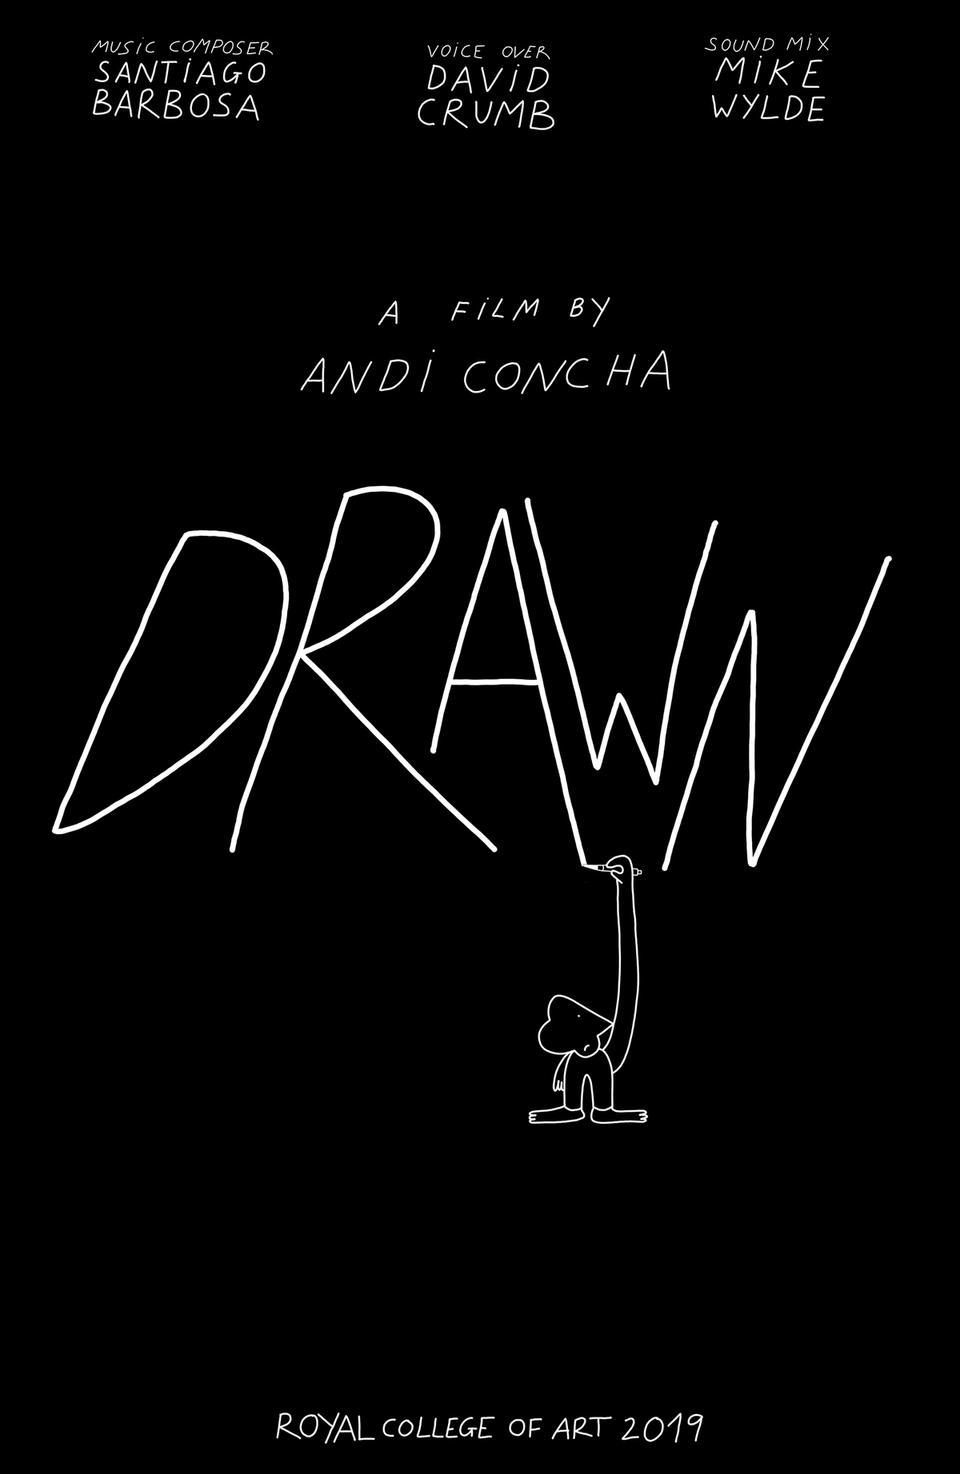 Andi Concha's Drawn